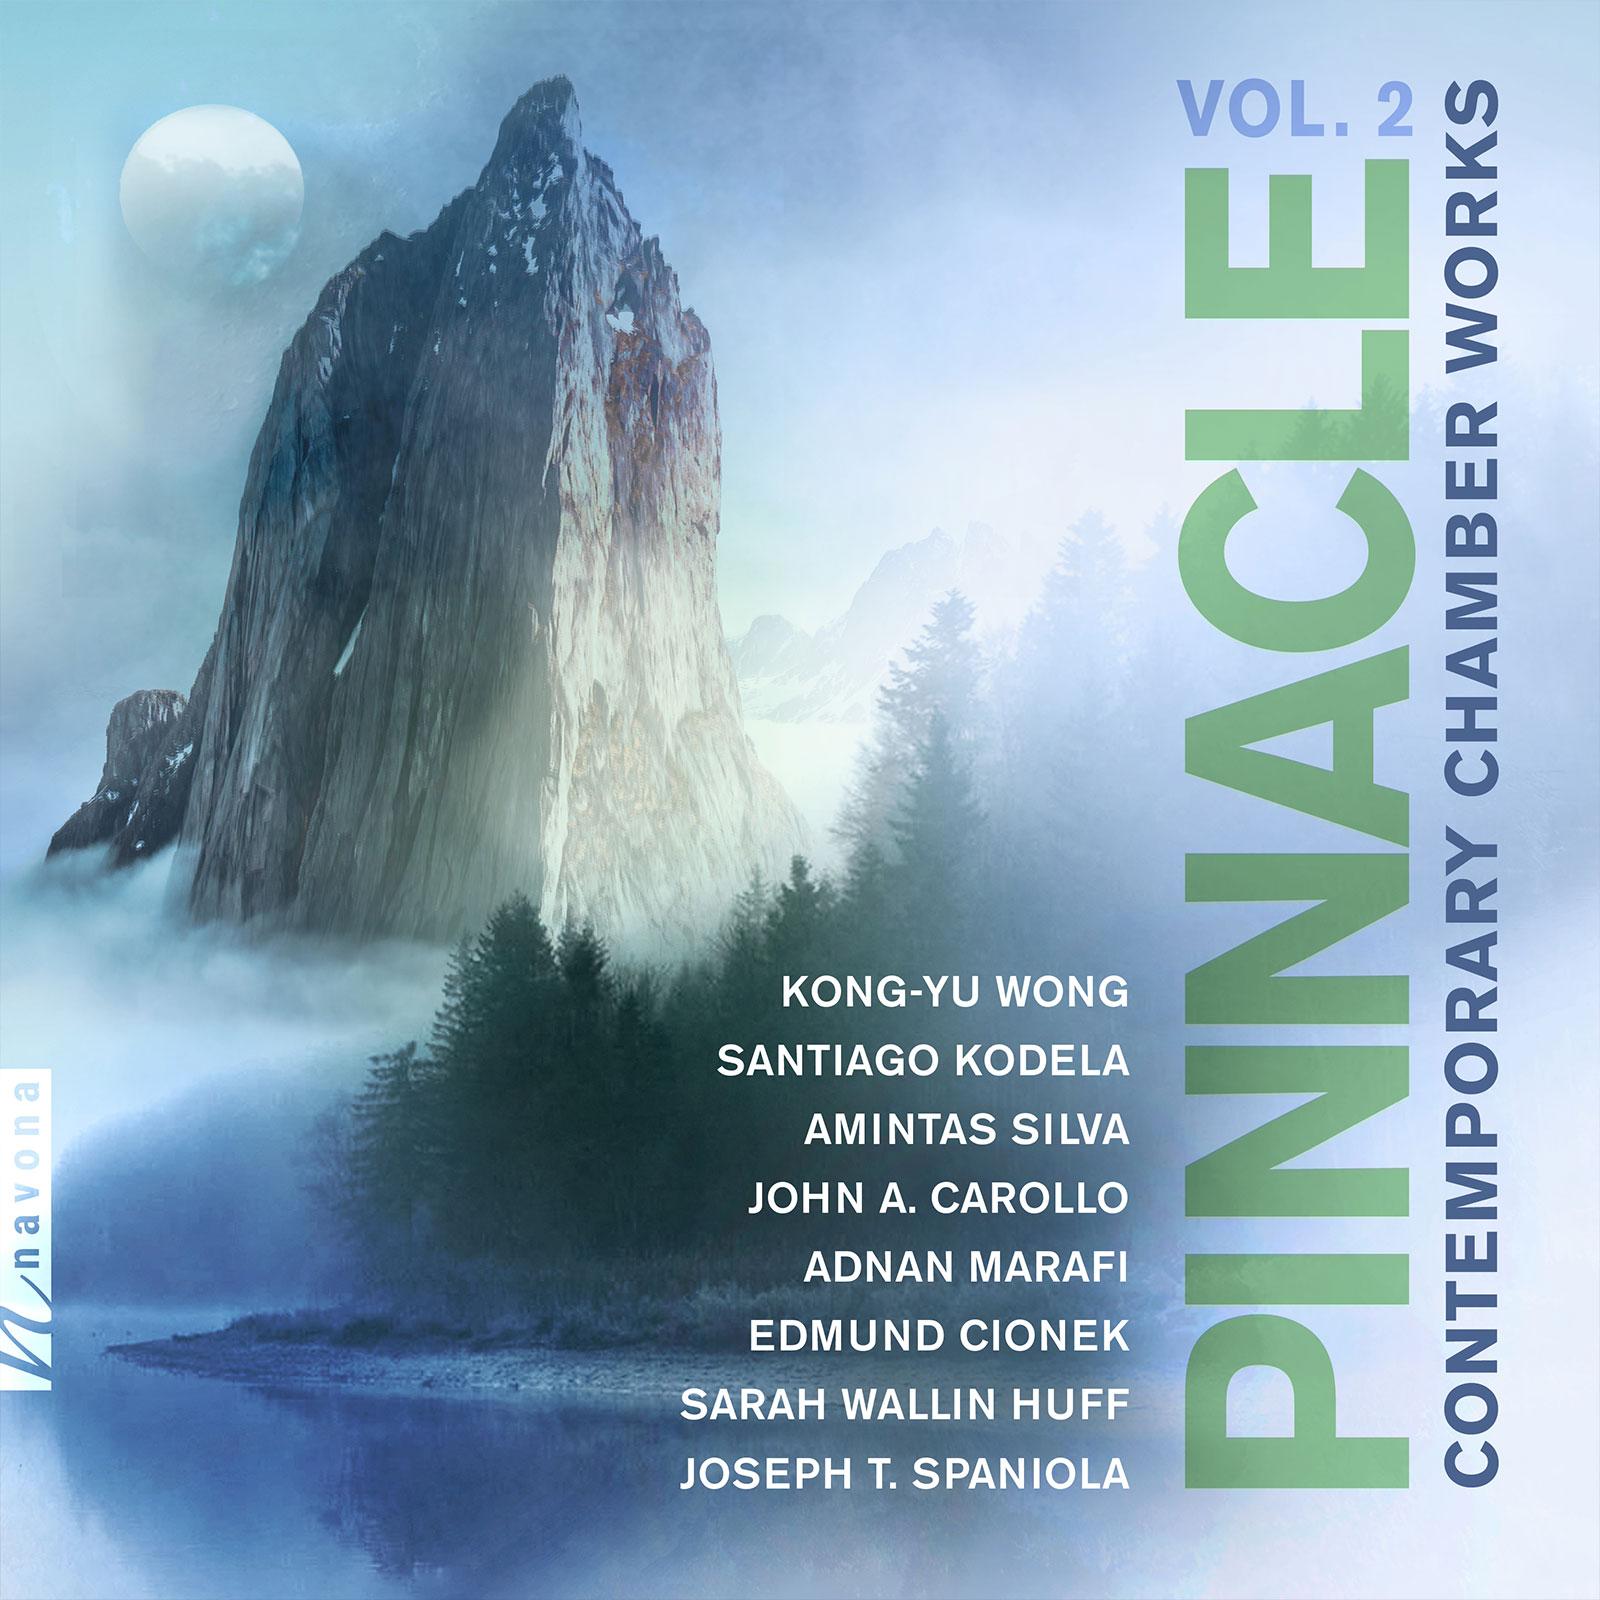 PINNACLE VOL. 2 - Album Cover